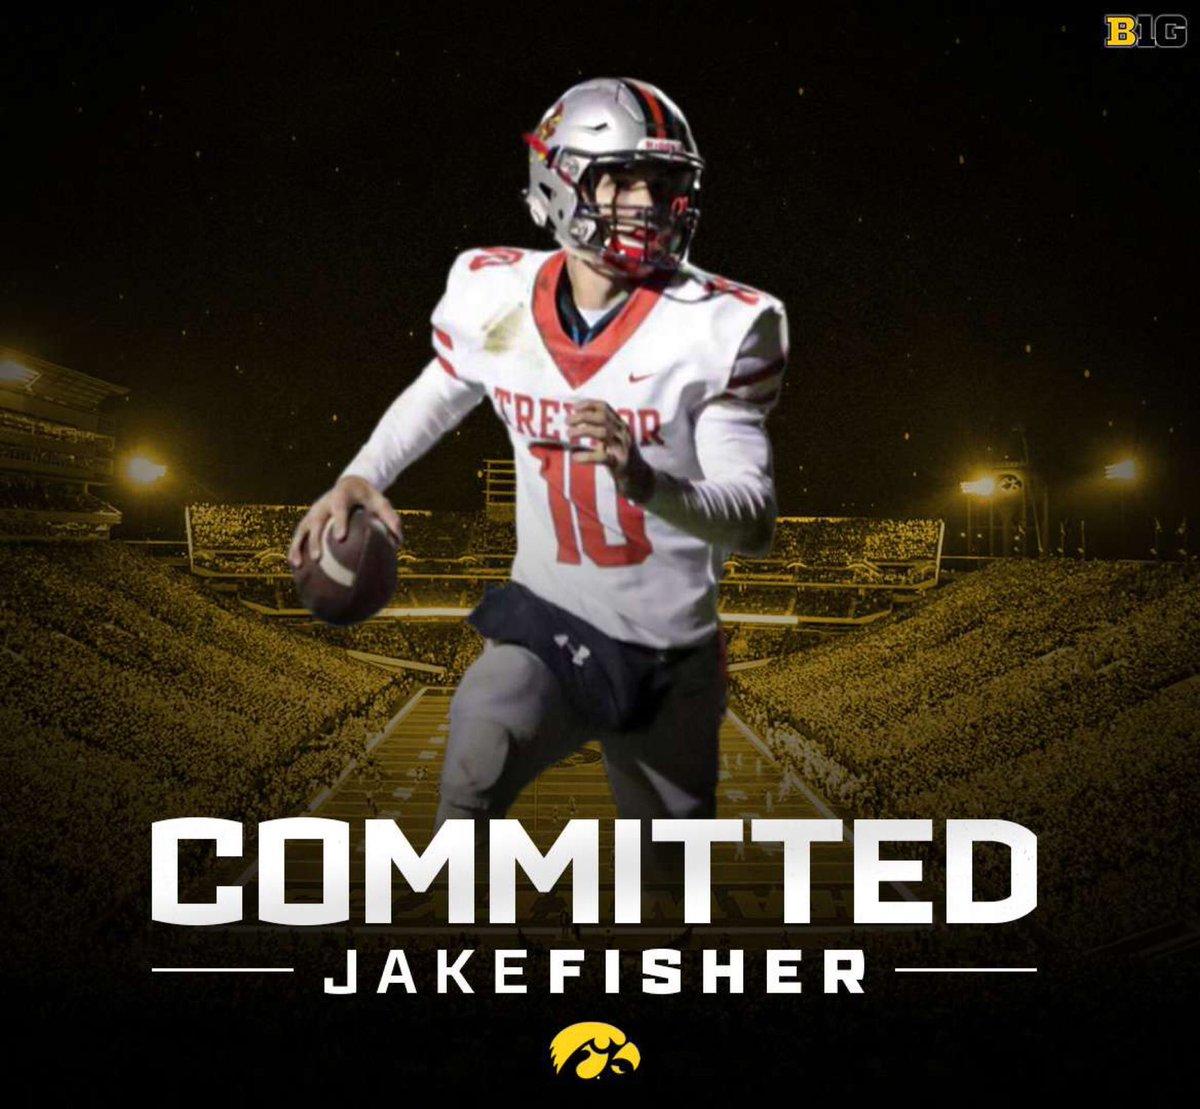 Jake Fisher Jersey